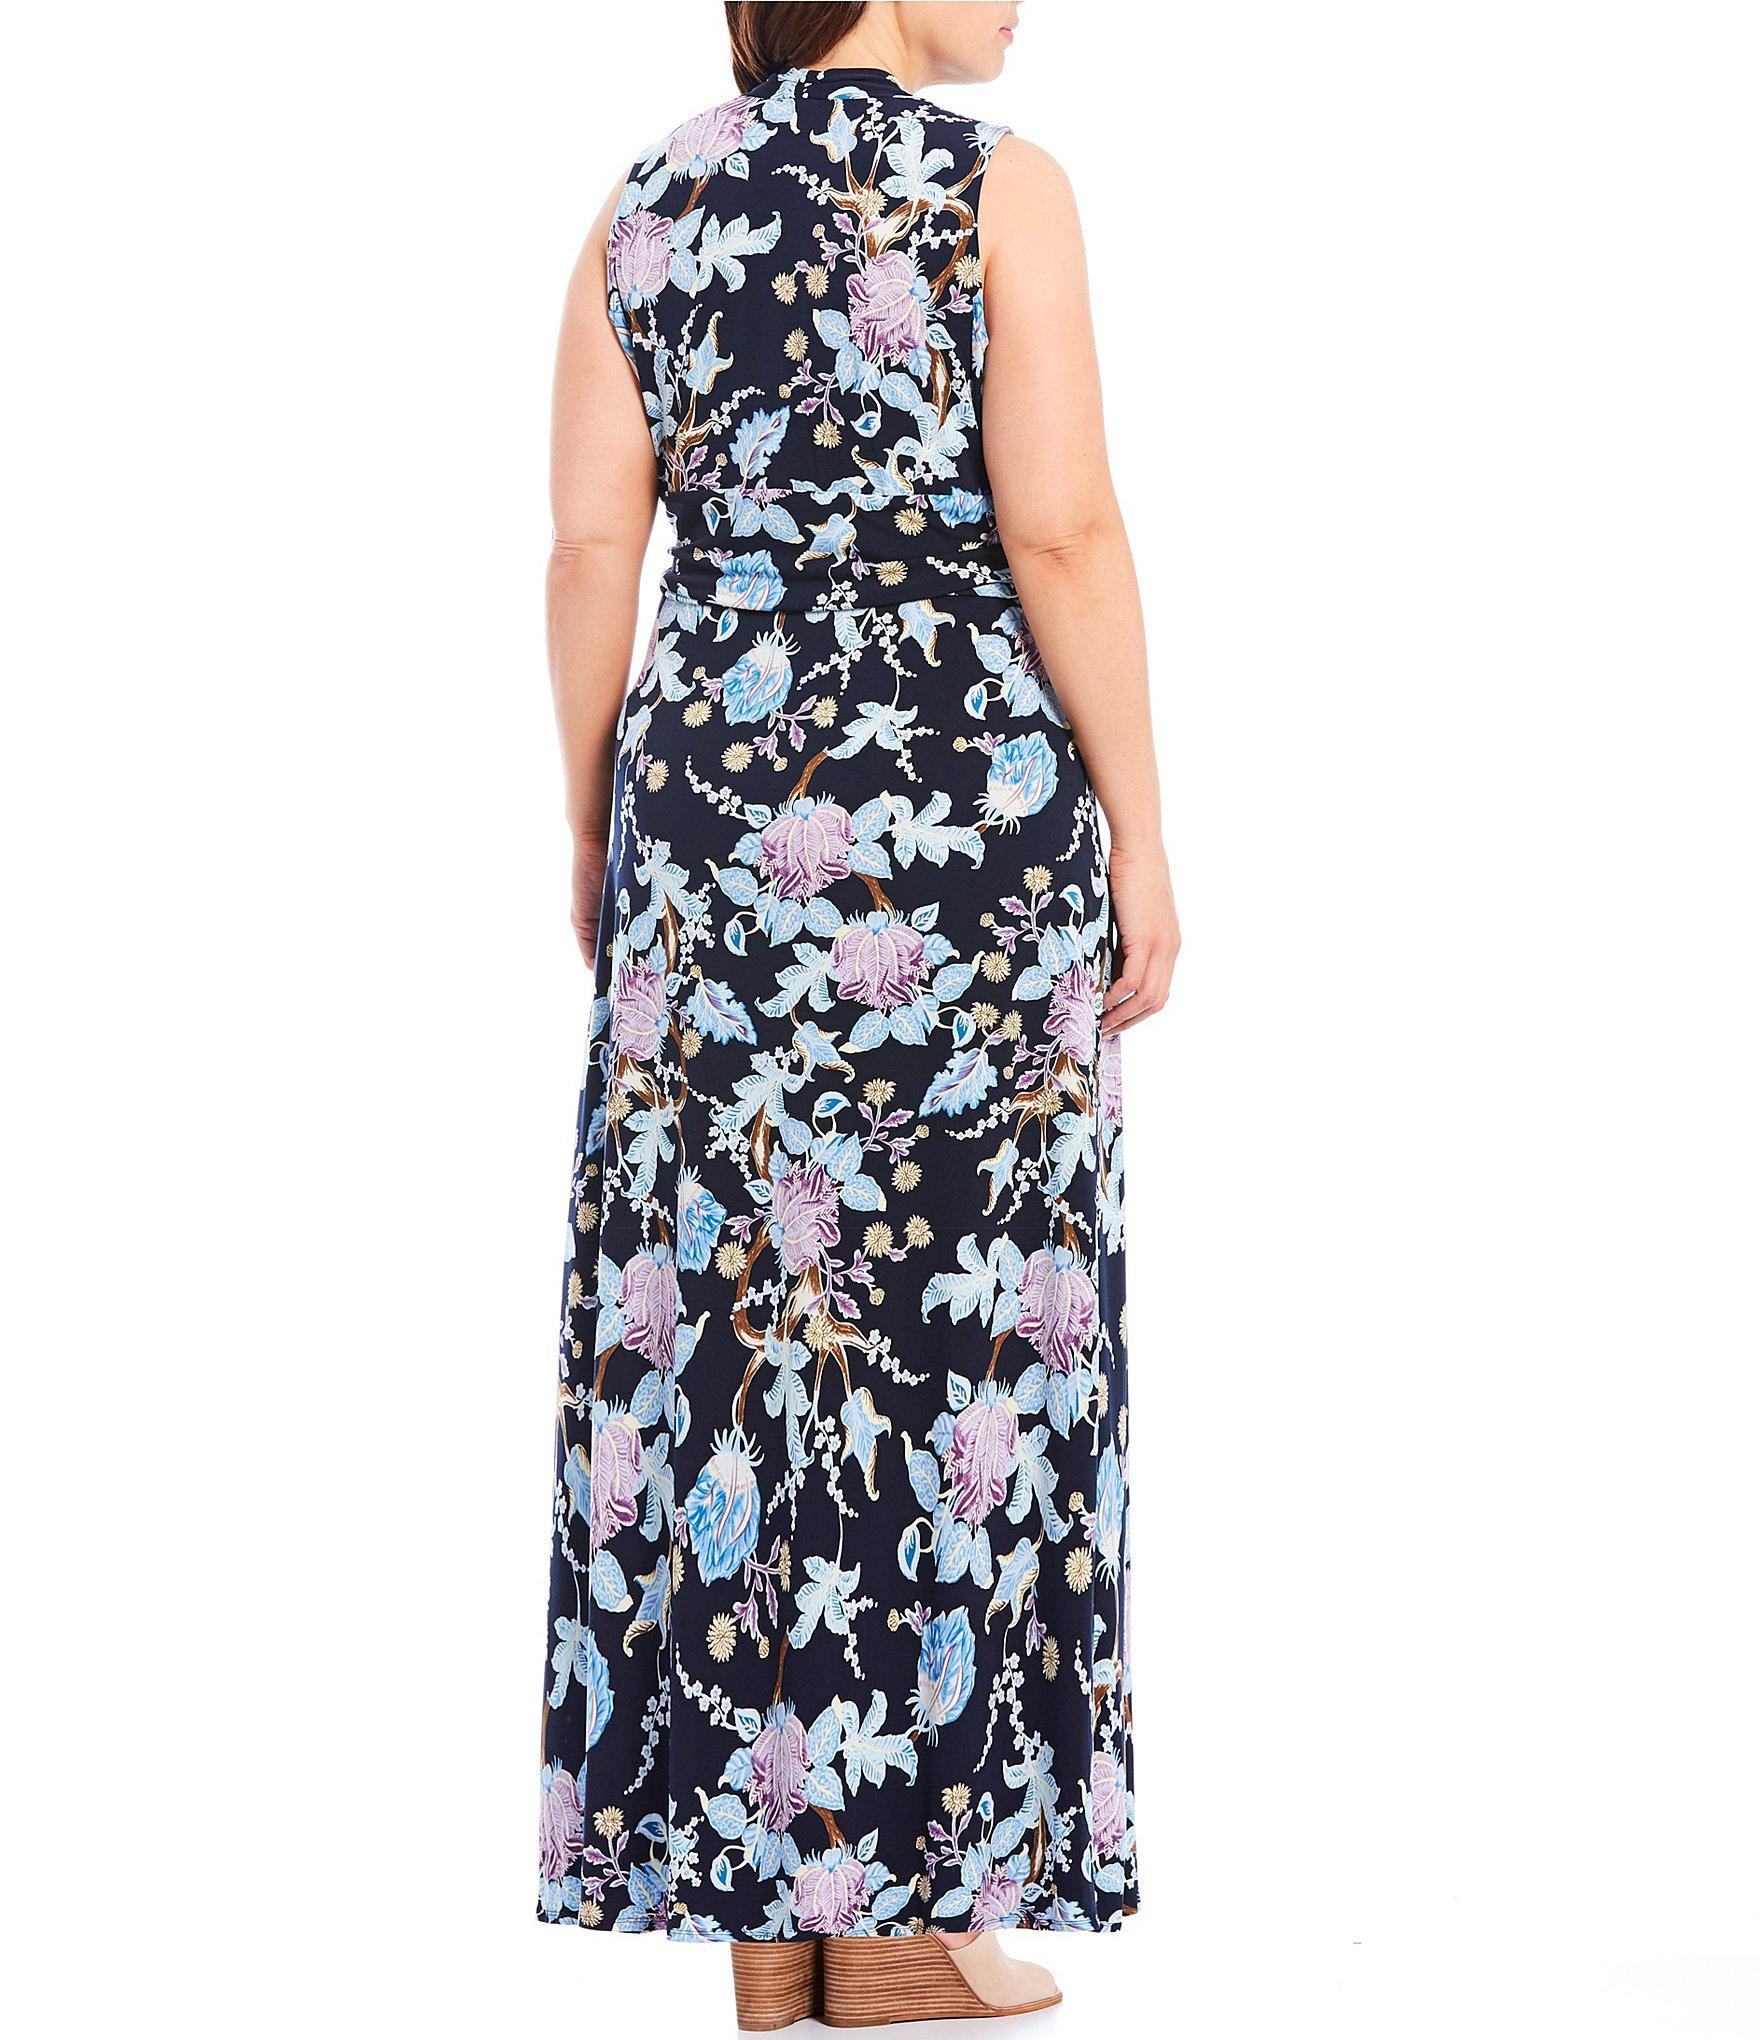 Poetic Blooms Printed Maxi Dress